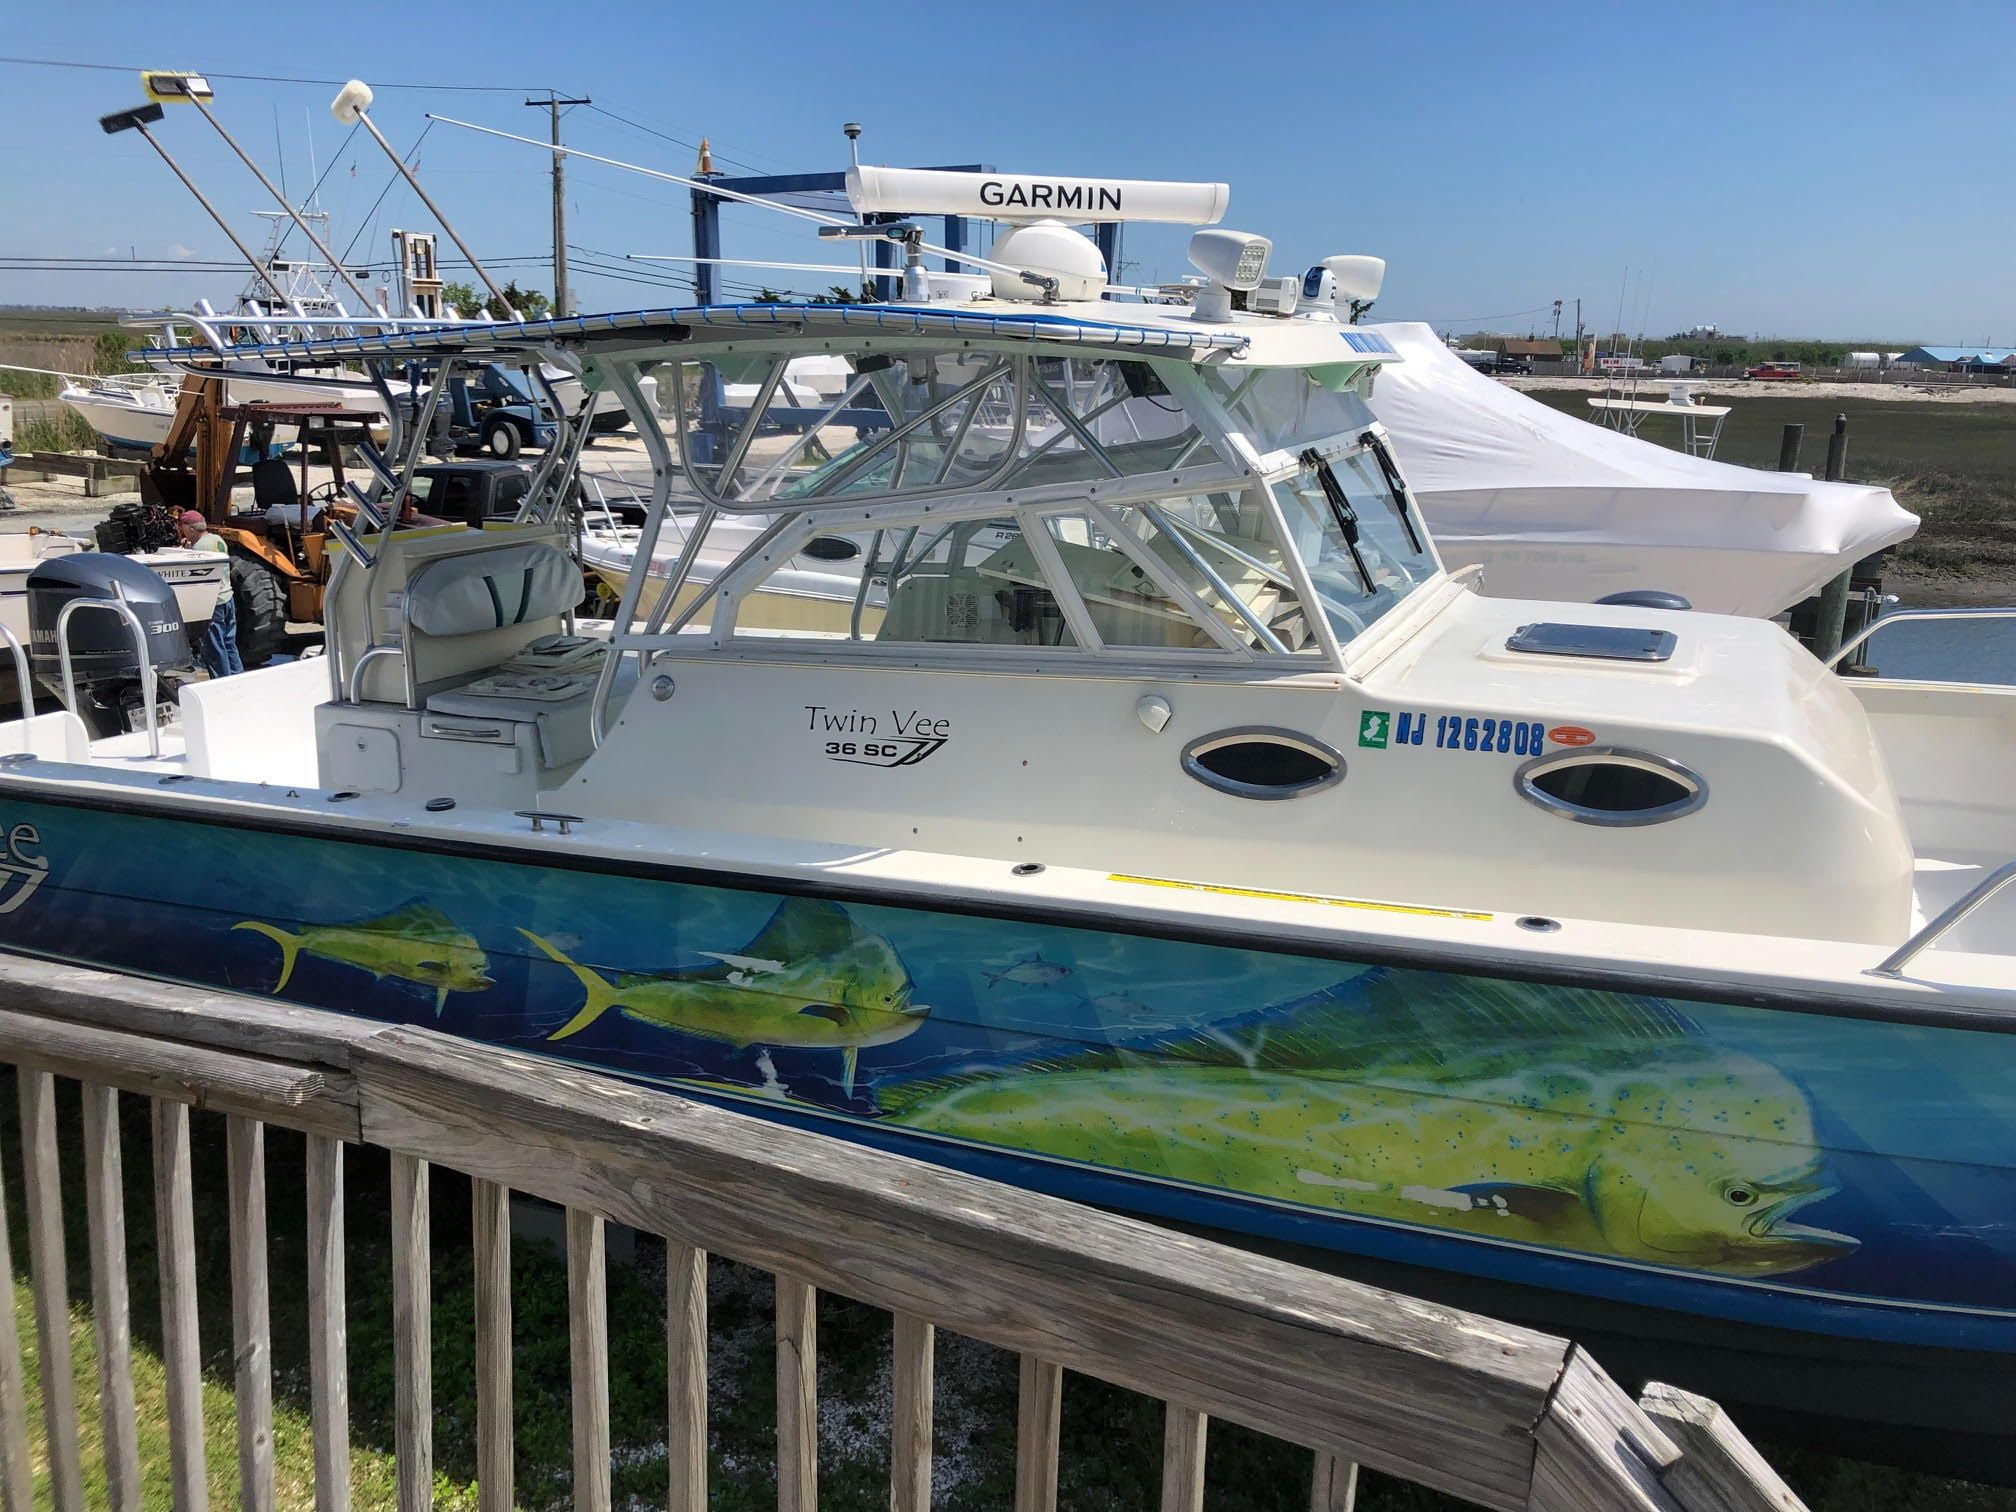 Deck boat, Spray on bedliner